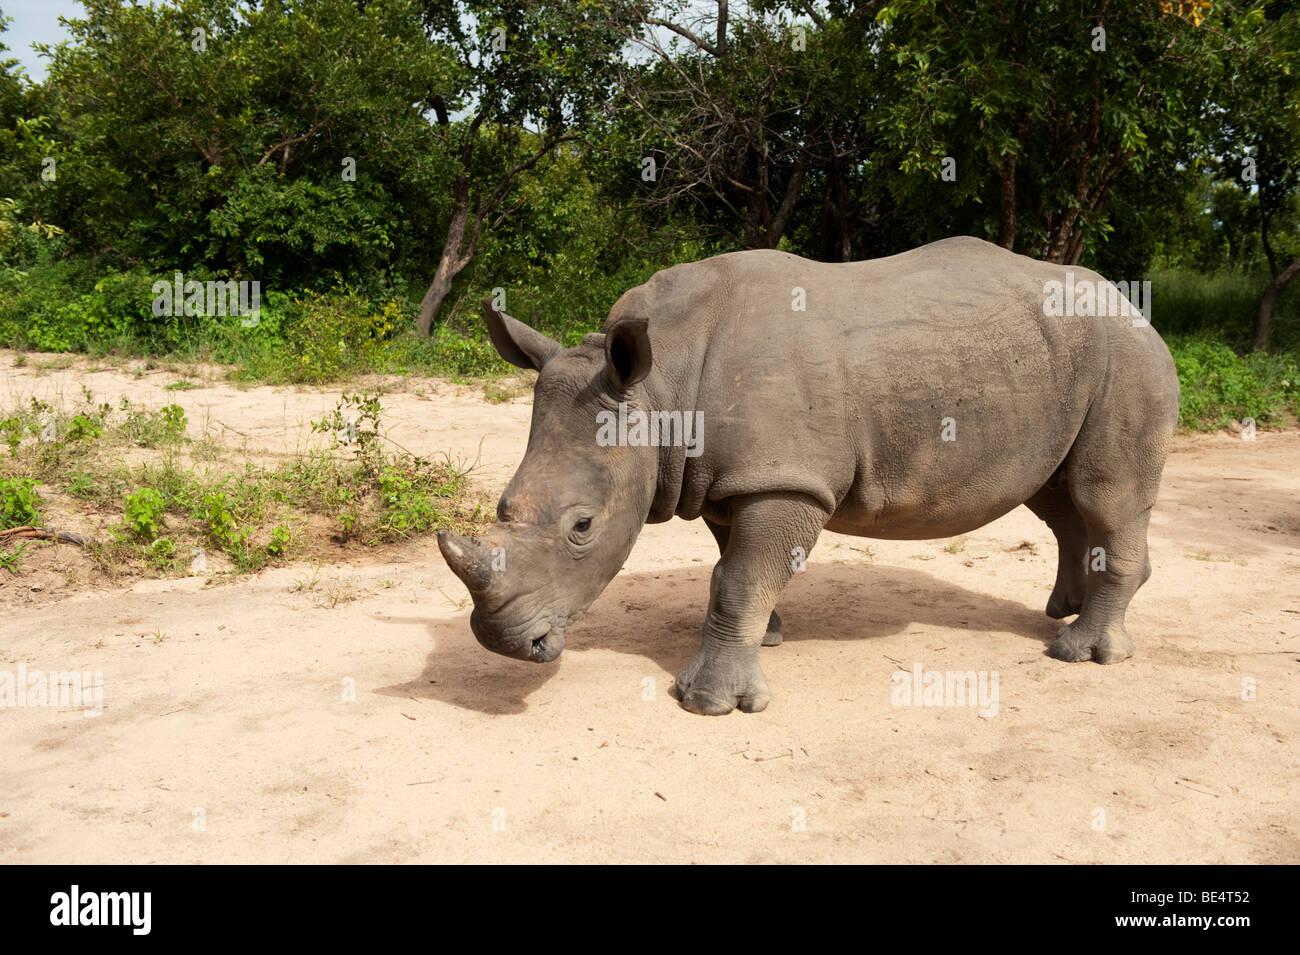 White rhinoceros (Ceratotherium simum), Hoedspruit Endangered Species Centre, Kapama, South Africa - Stock Image